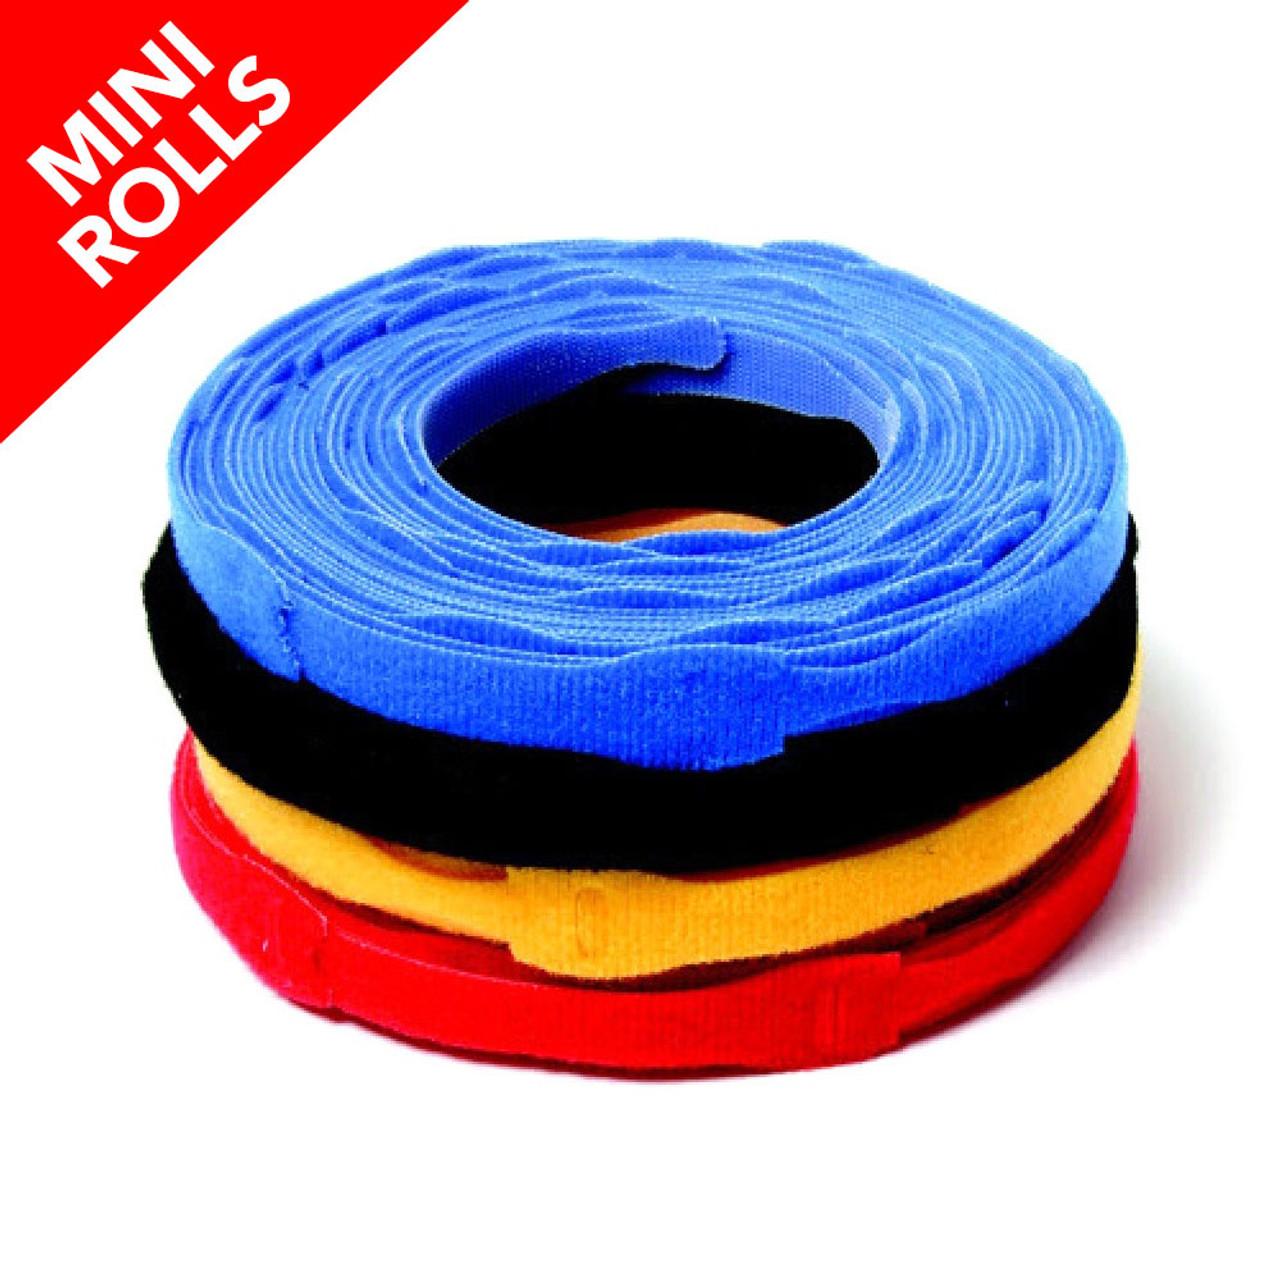 VELCRO ® Brand ONE-WRAP ® Die-Cut Straps - Mini Rolls / Velcro Straps - Bundling Straps - Velcro Tie - Velcro Strap